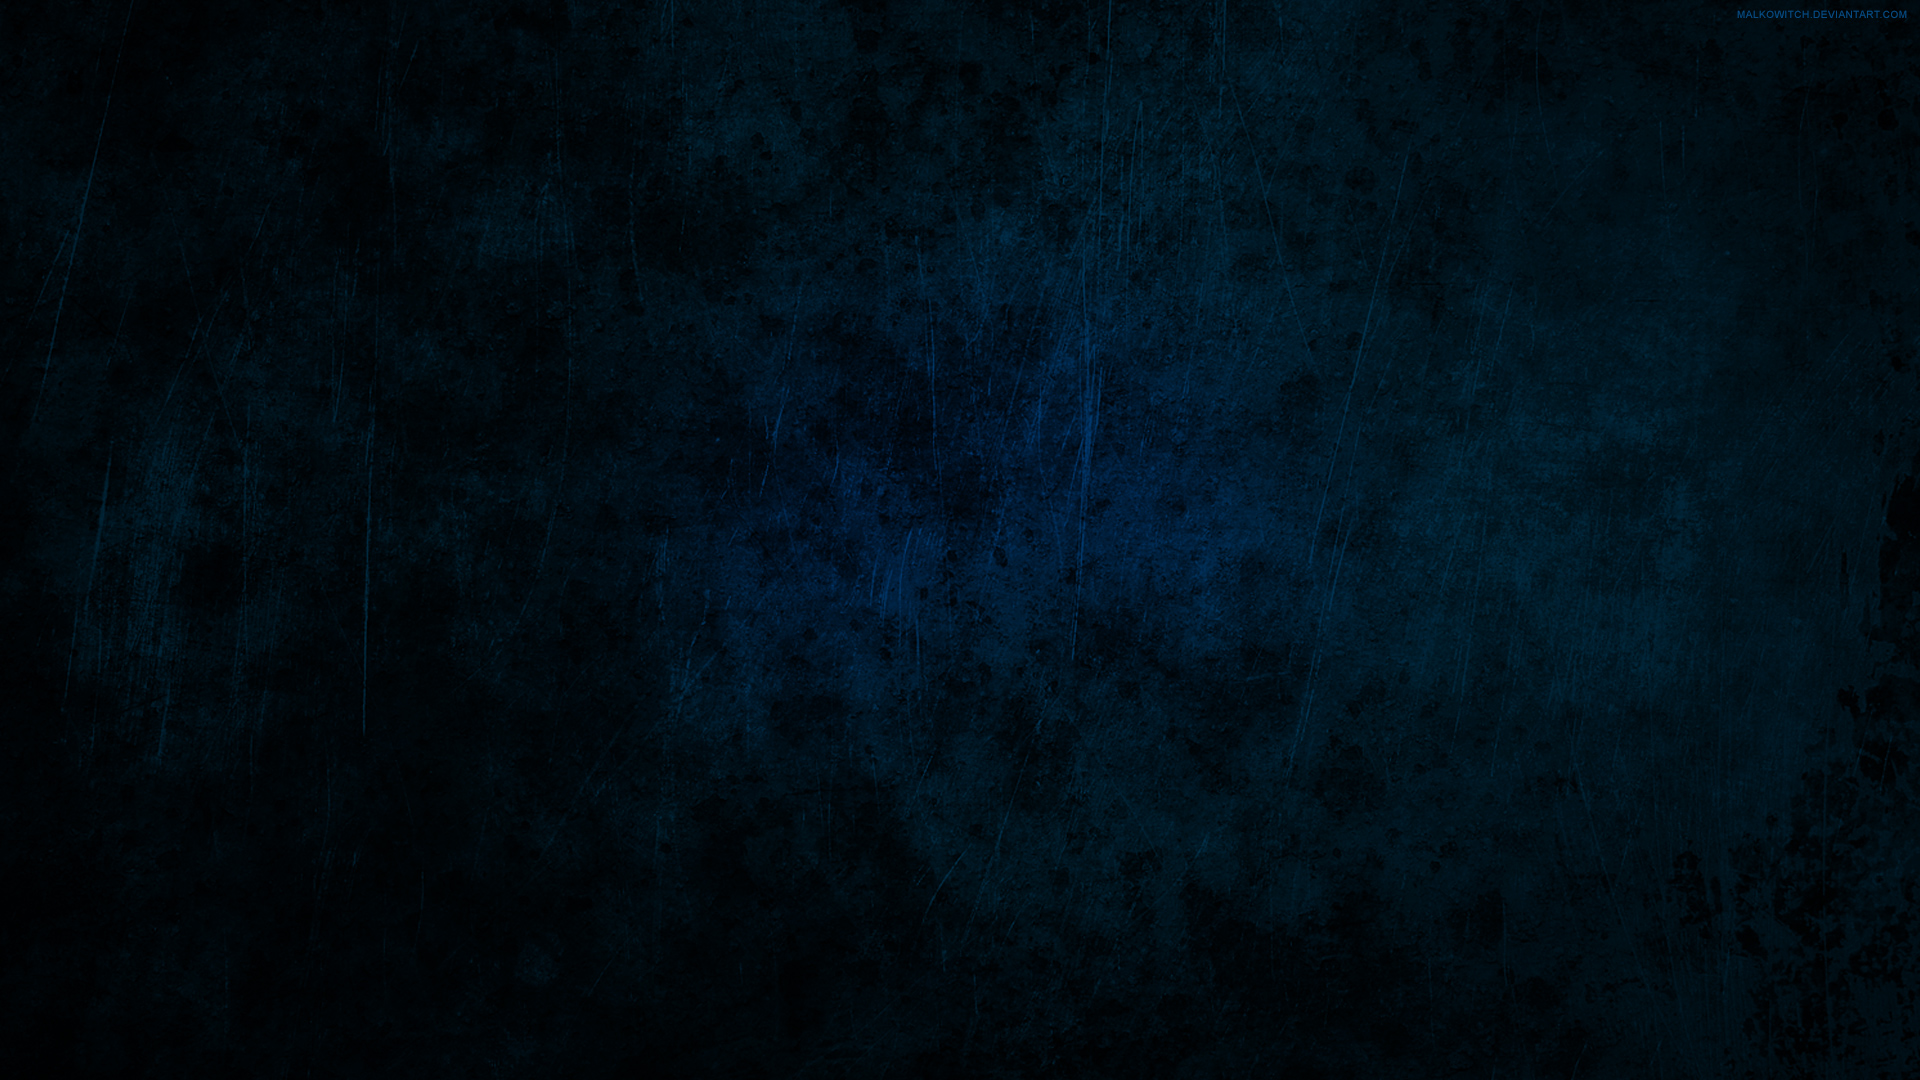 Dark Blue Backgrounds Wallpaper | Best Cool Wallpaper HD Download